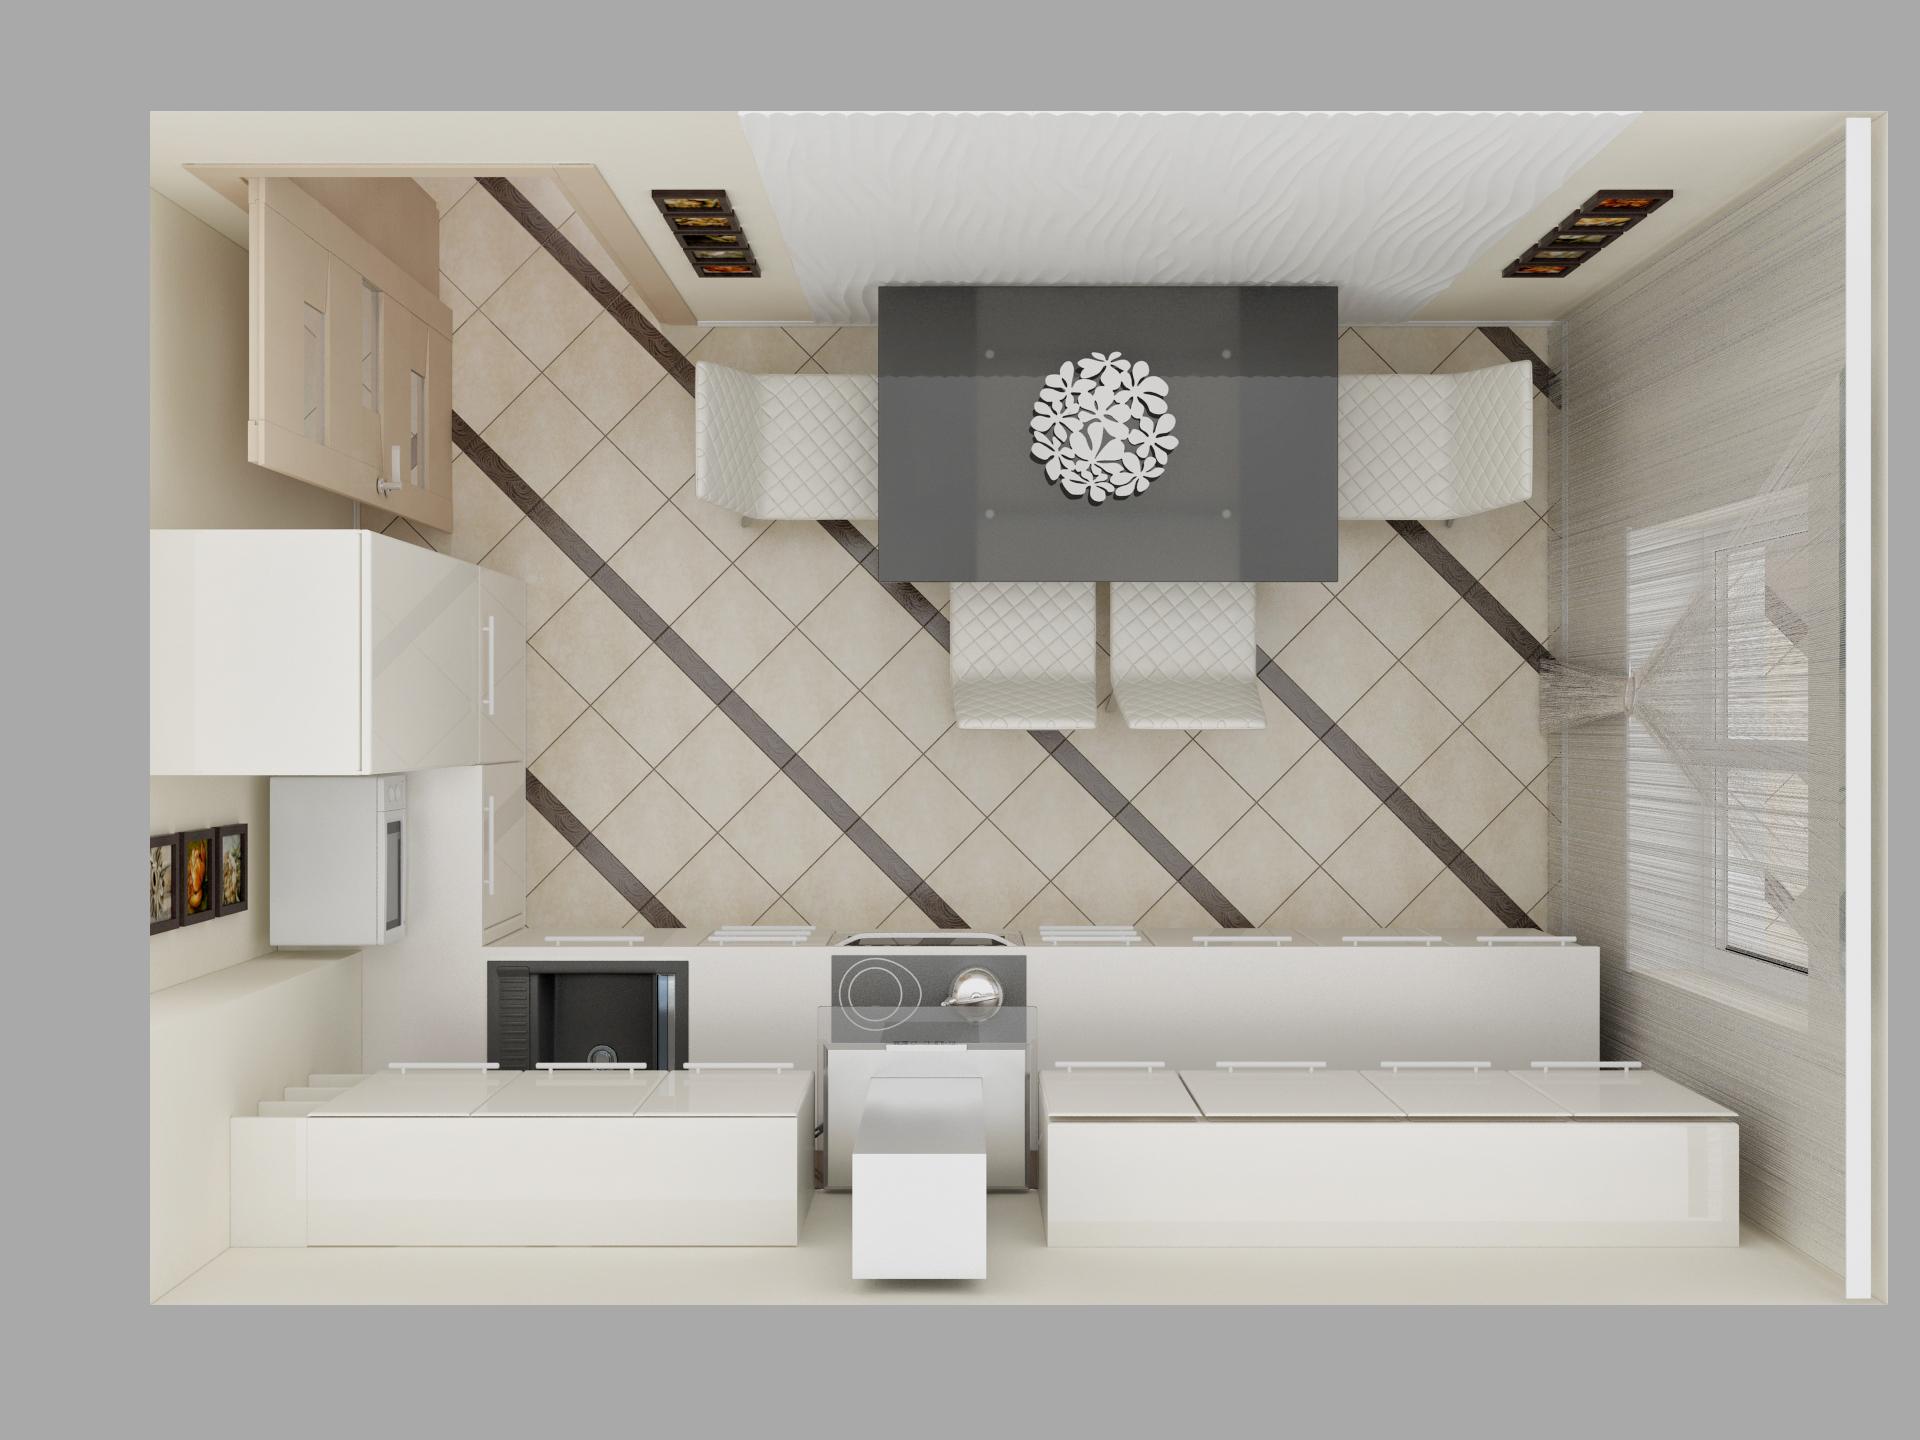 Вид сверху 3d эскиза кухни